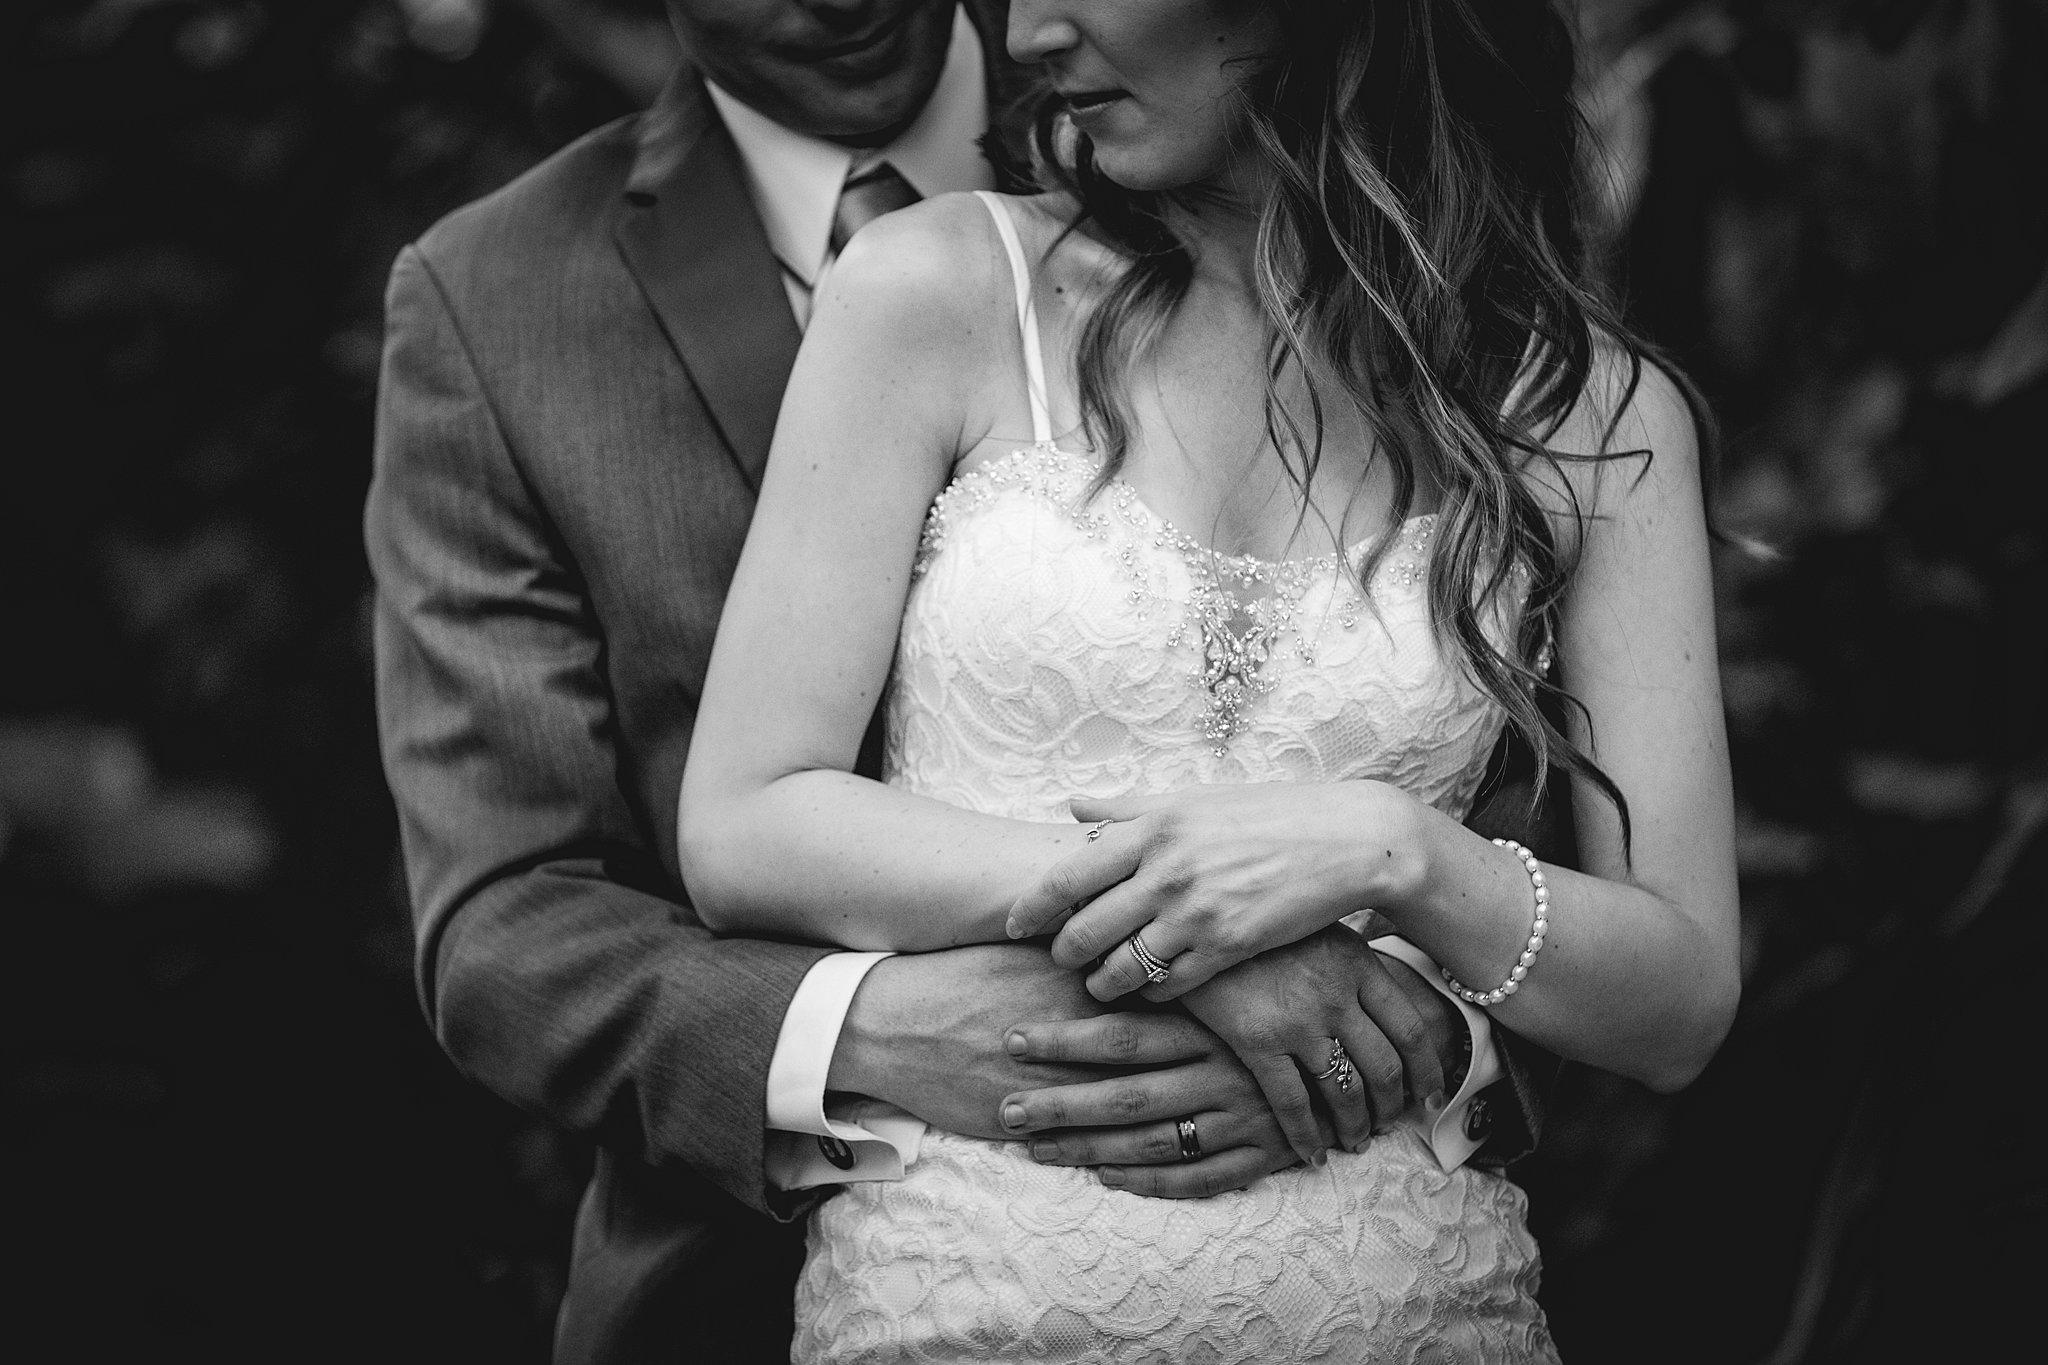 wedding photography, wedding photographers, elopement photography, engagement photos, calgary photographer, Kananaskis, Rocky Mountain, Canmore photographer